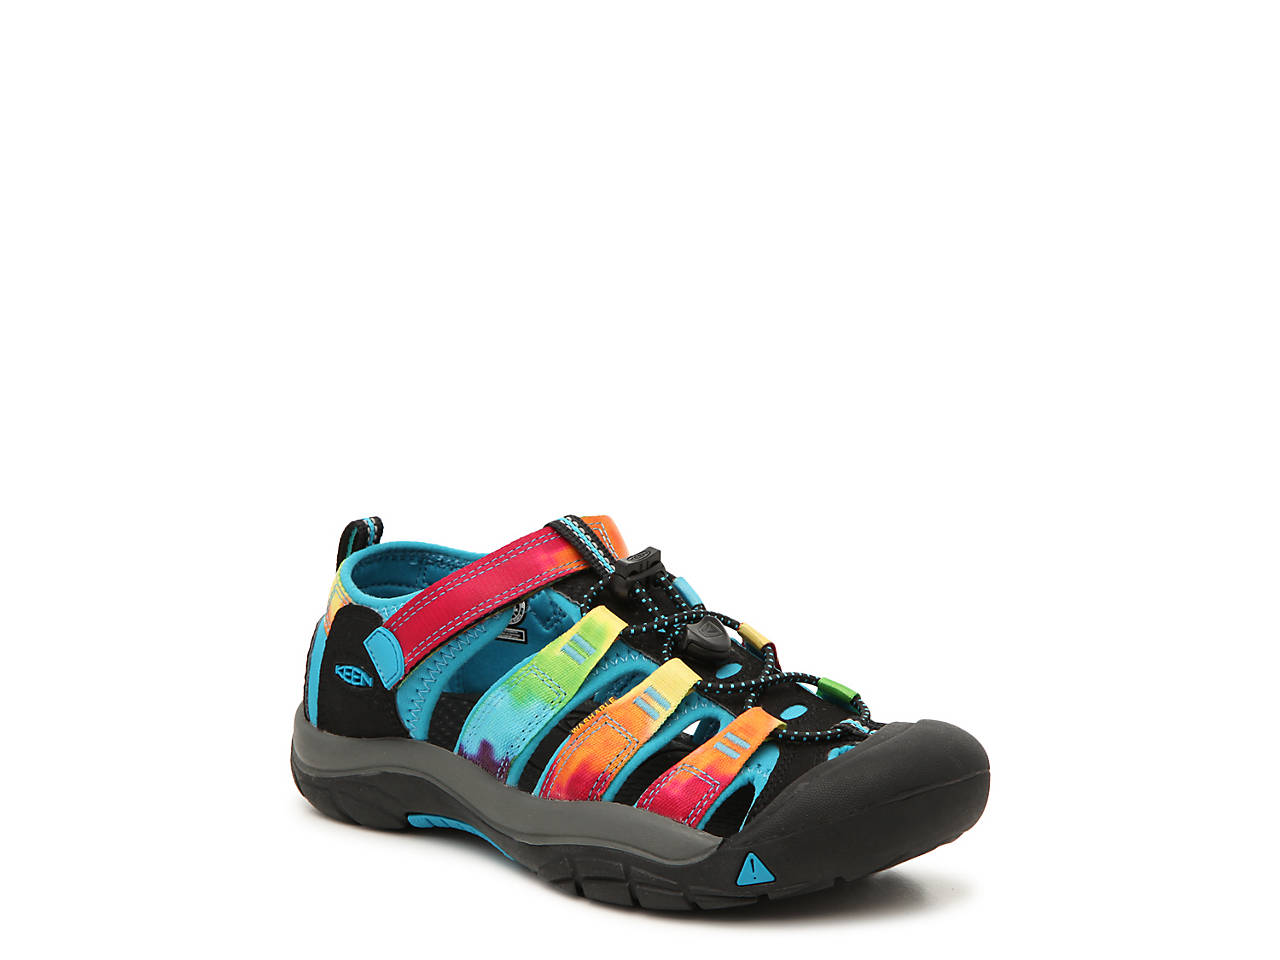 4d508c96f1d1 Keen Newport H2 Toddler   Youth Sandal Kids Shoes